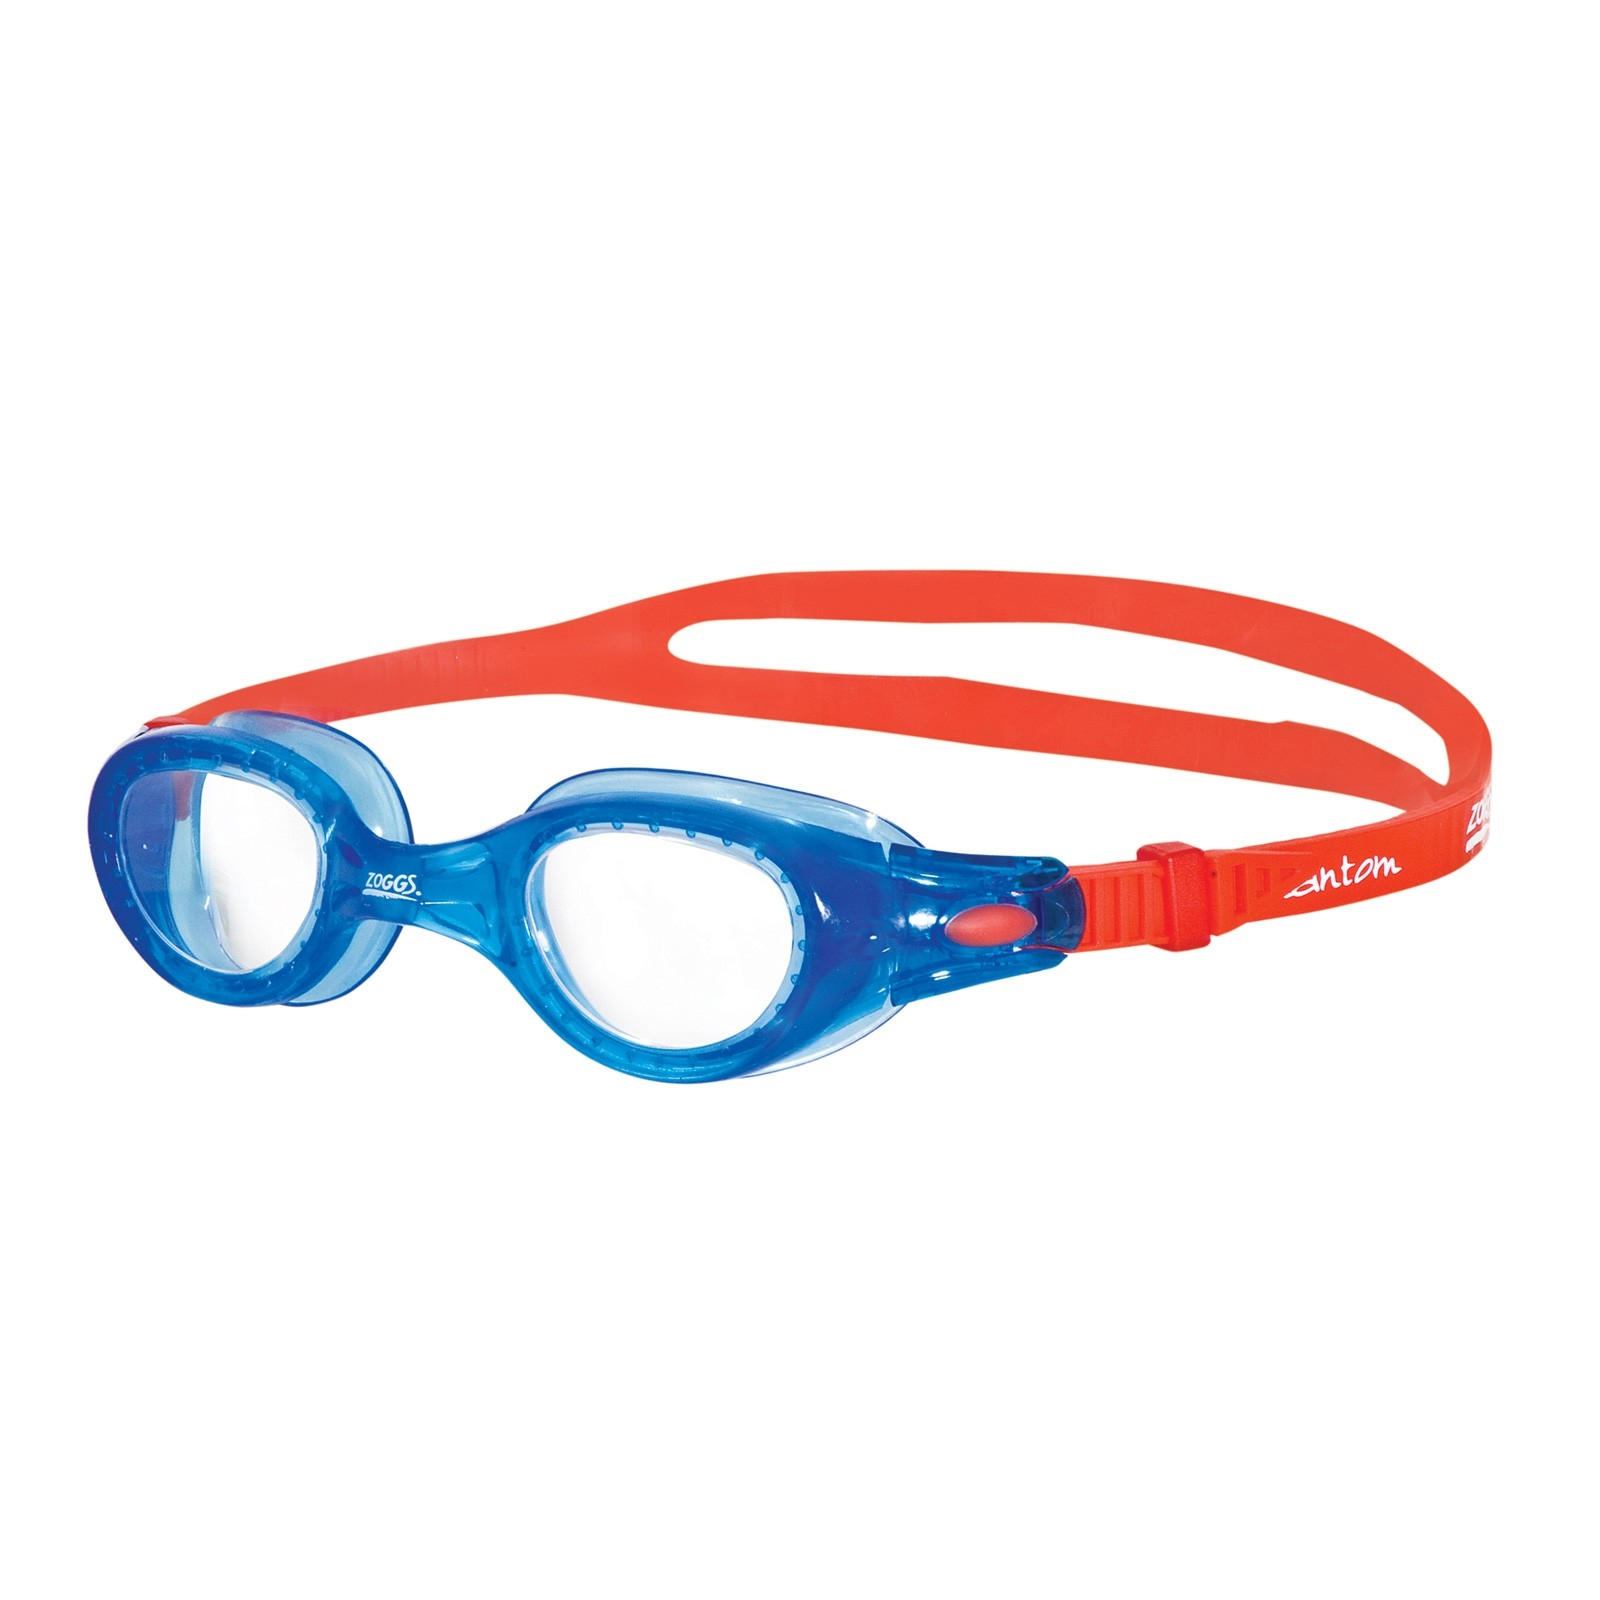 New zoggs little phantom junior swimming goggles kids swim for Pool koi goggles